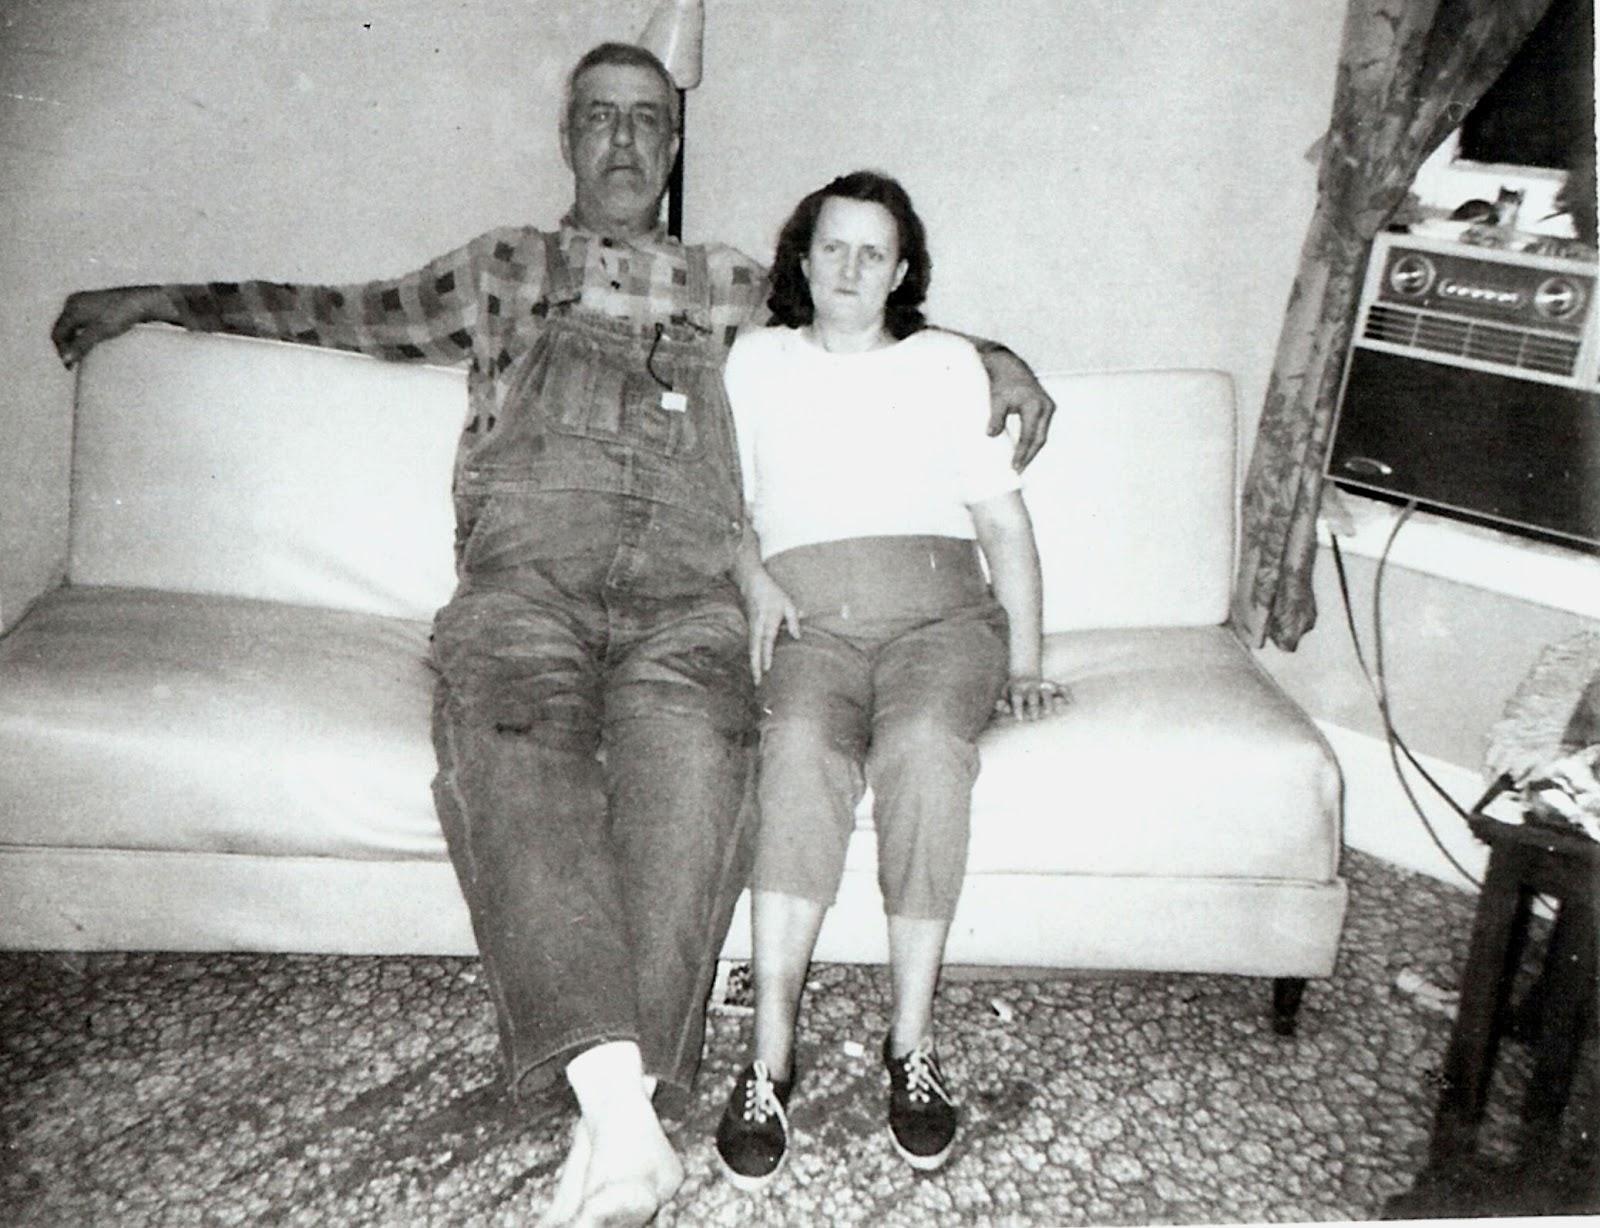 Roy Davis & May Pauline Tate 913 Ely, Hannibal.jpg